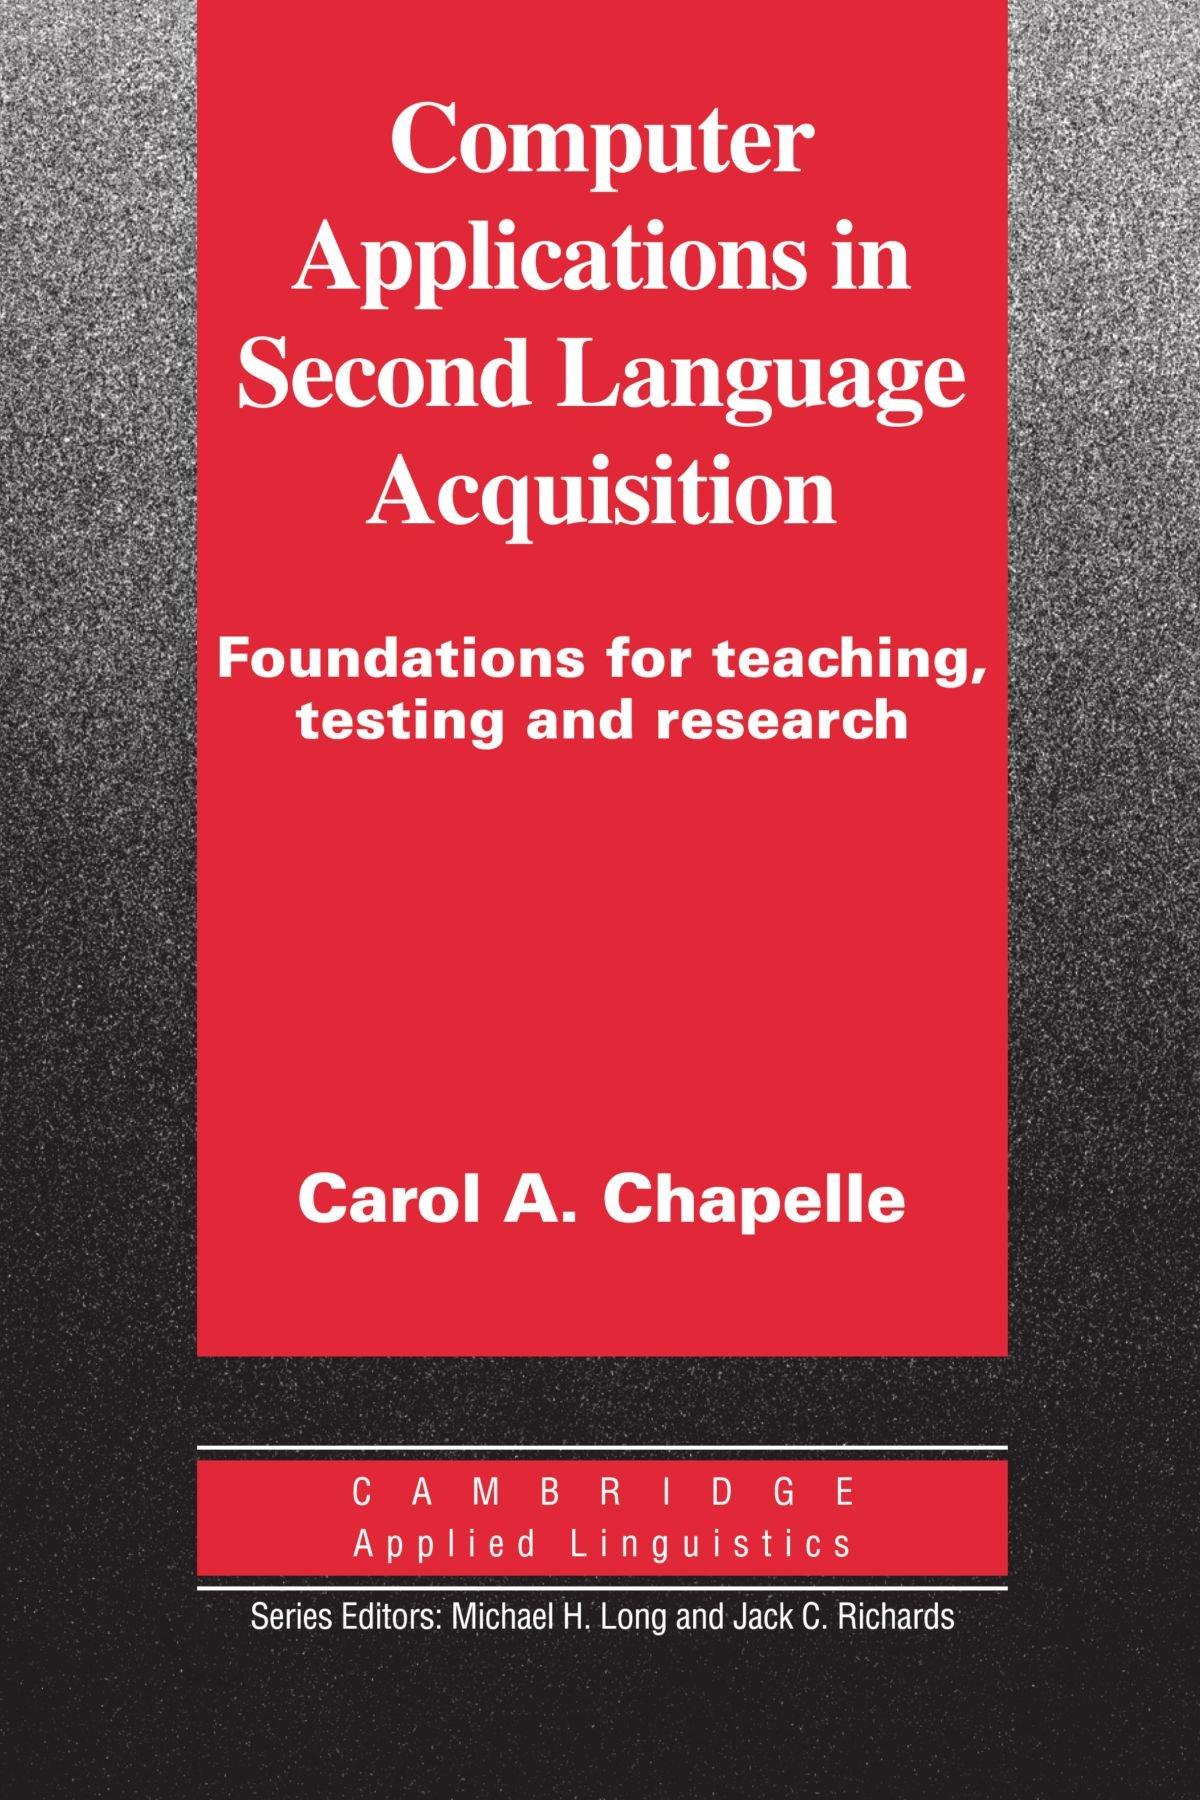 Computer Applications in Second Language Acquisition (Cambridge Applied Linguistics)